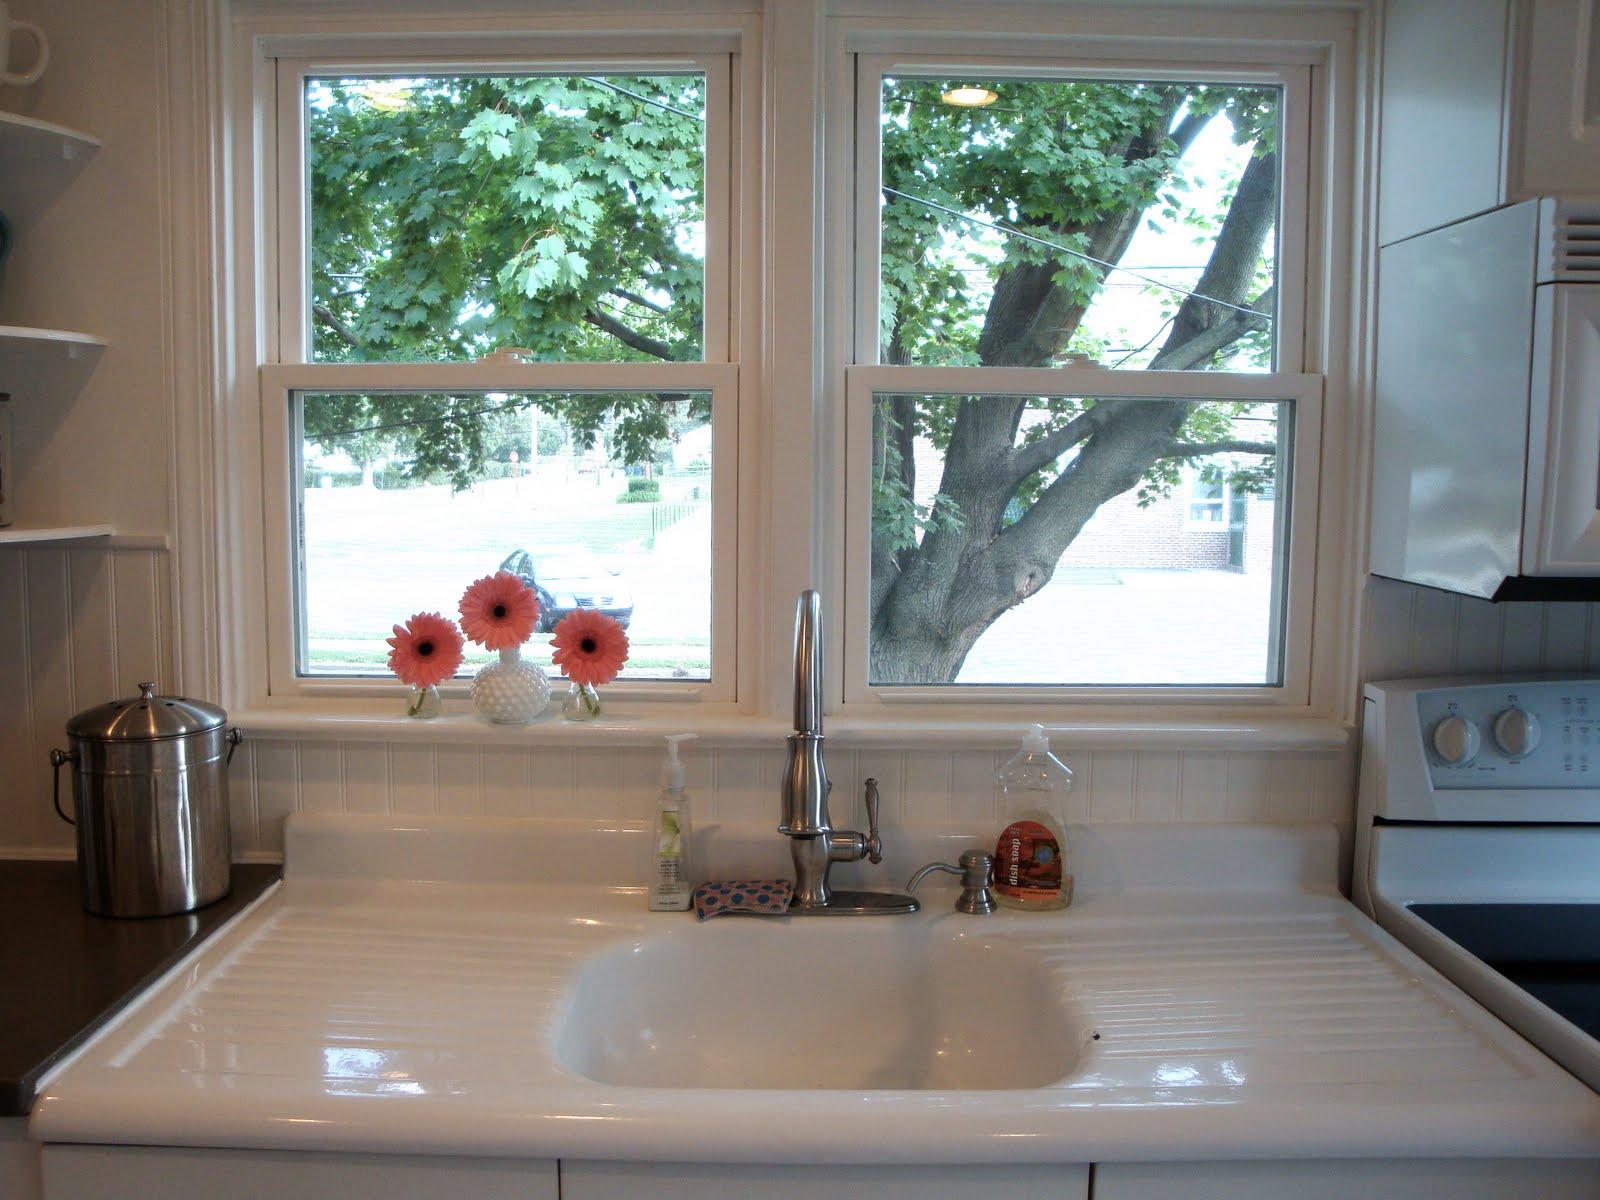 Amazon Kitchen Cabinet Doors Corner Sink Ideas Remodelaholic | Backsplash Tiles, Now Beadboard